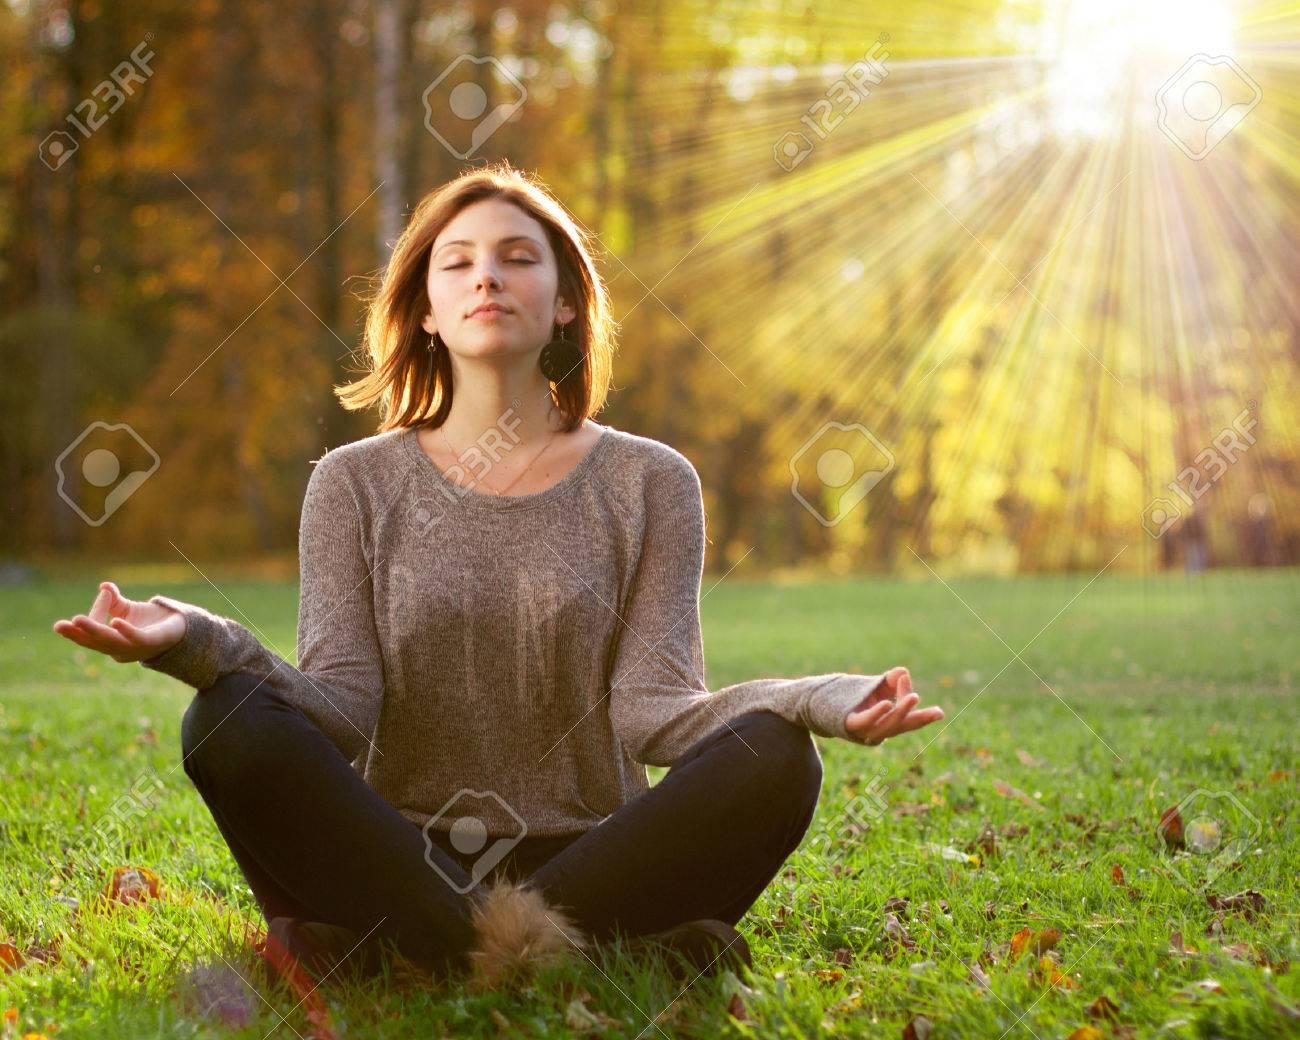 Beautiful young girl meditating in autumn park Stock Photo - 24564720